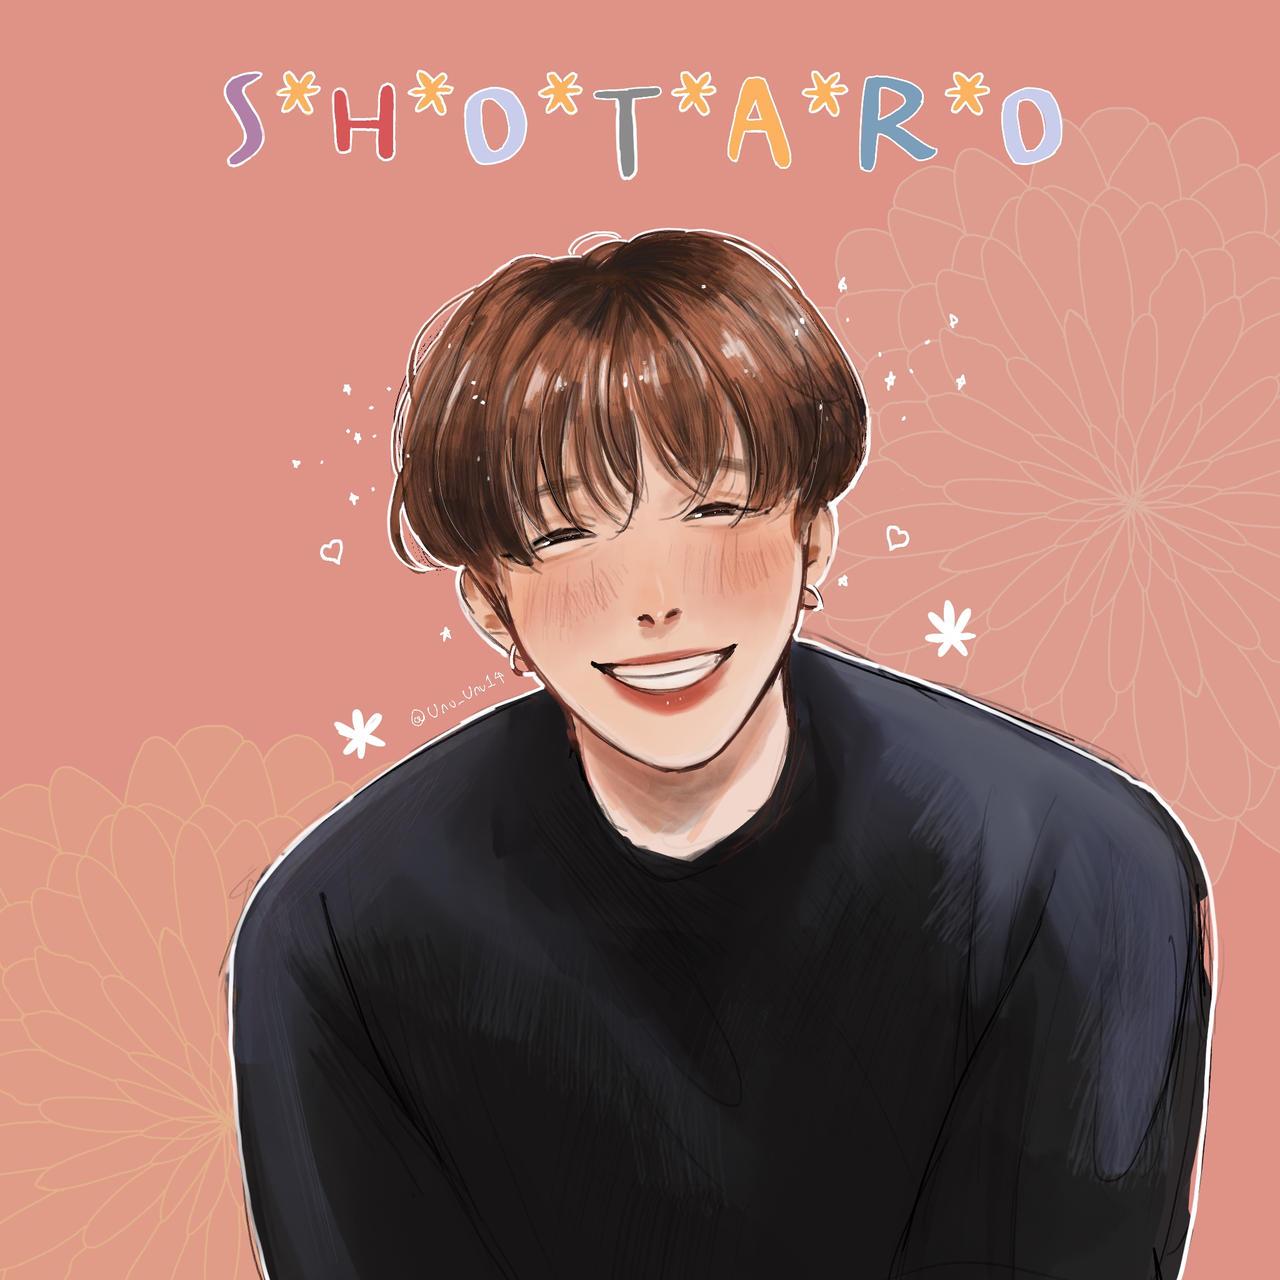 Shotaro Nct Fanart